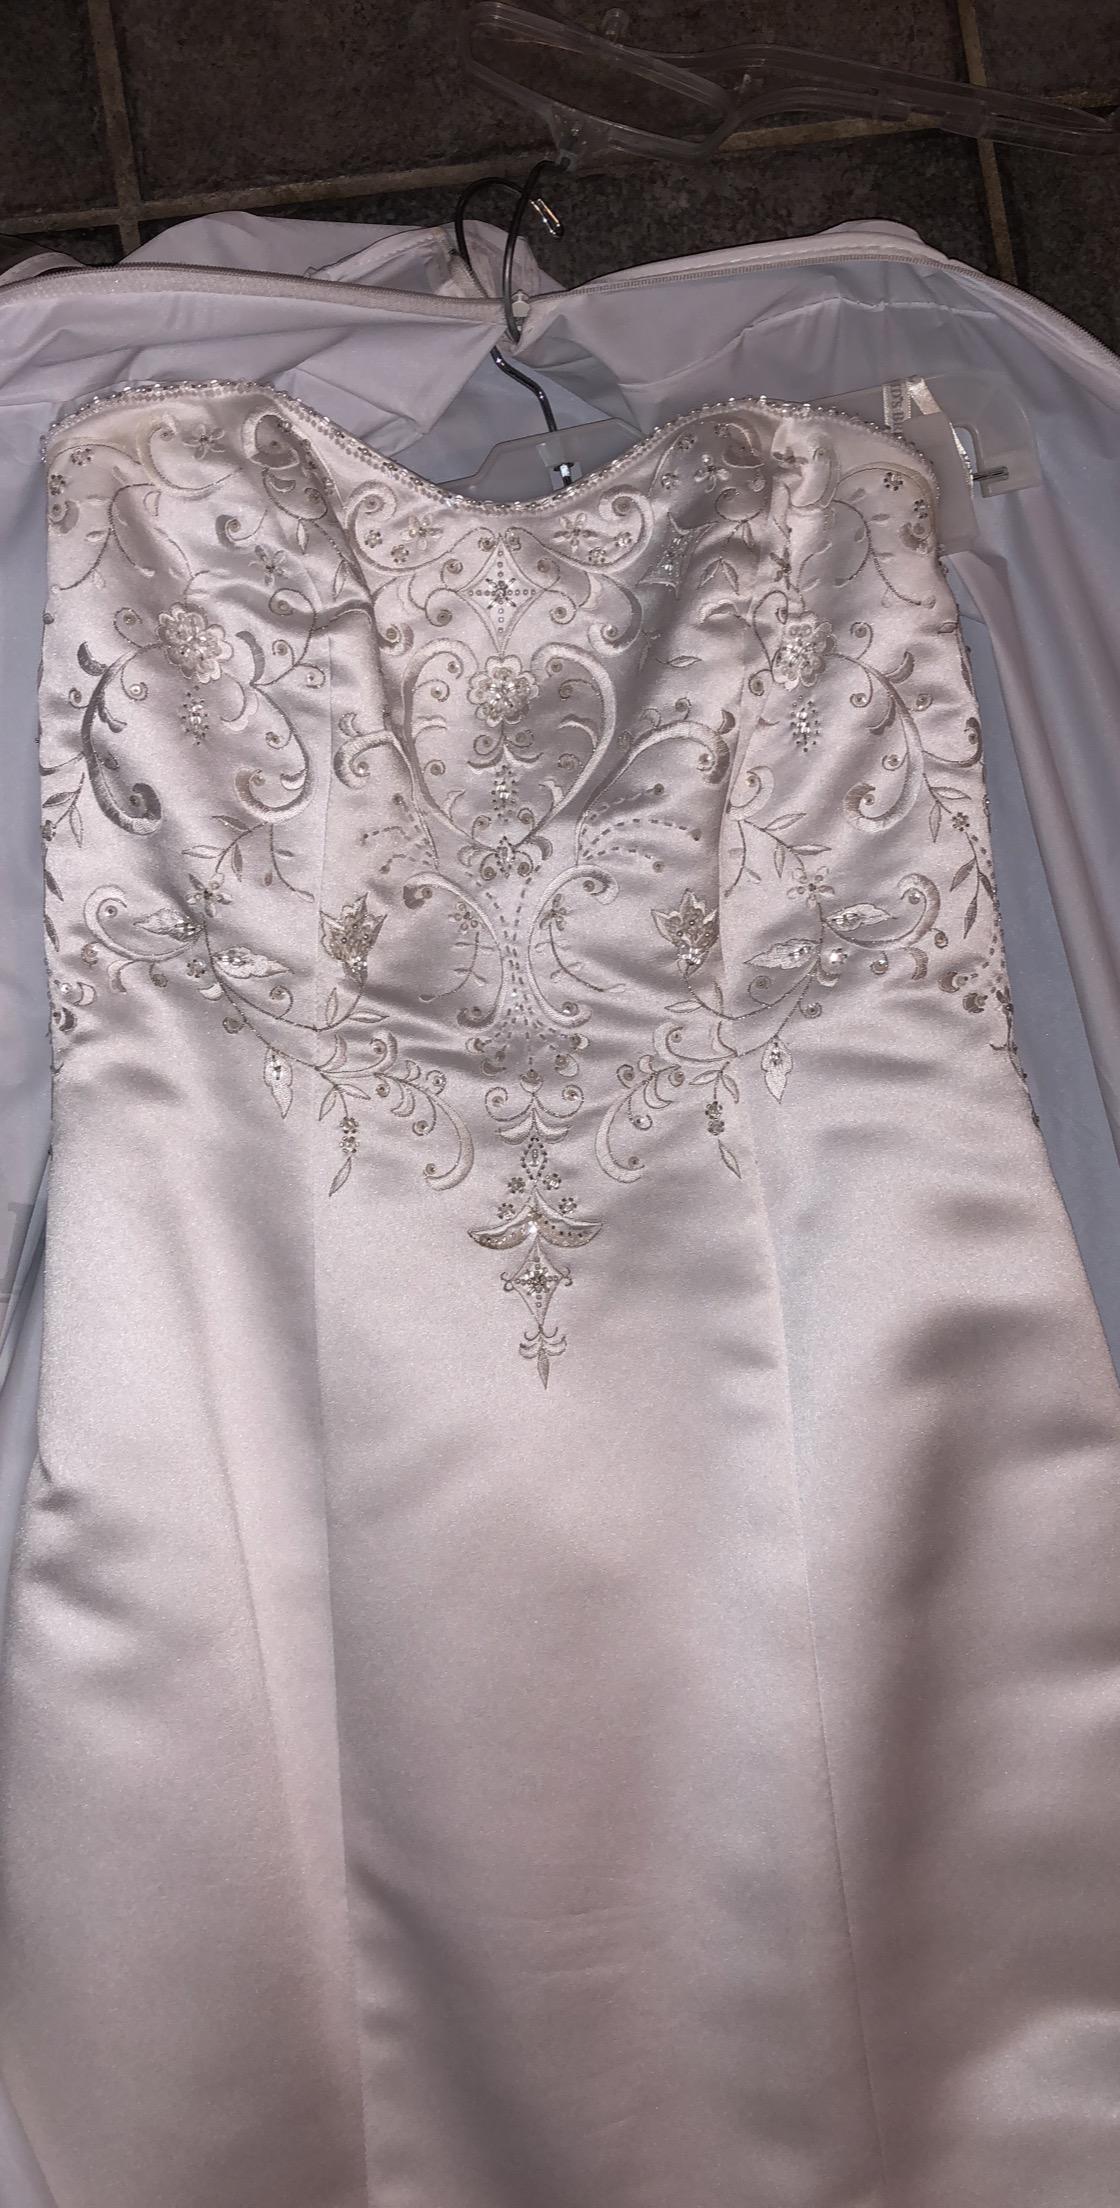 Sell Wedding Dress with the #1 site in the U.S. | Weddalia